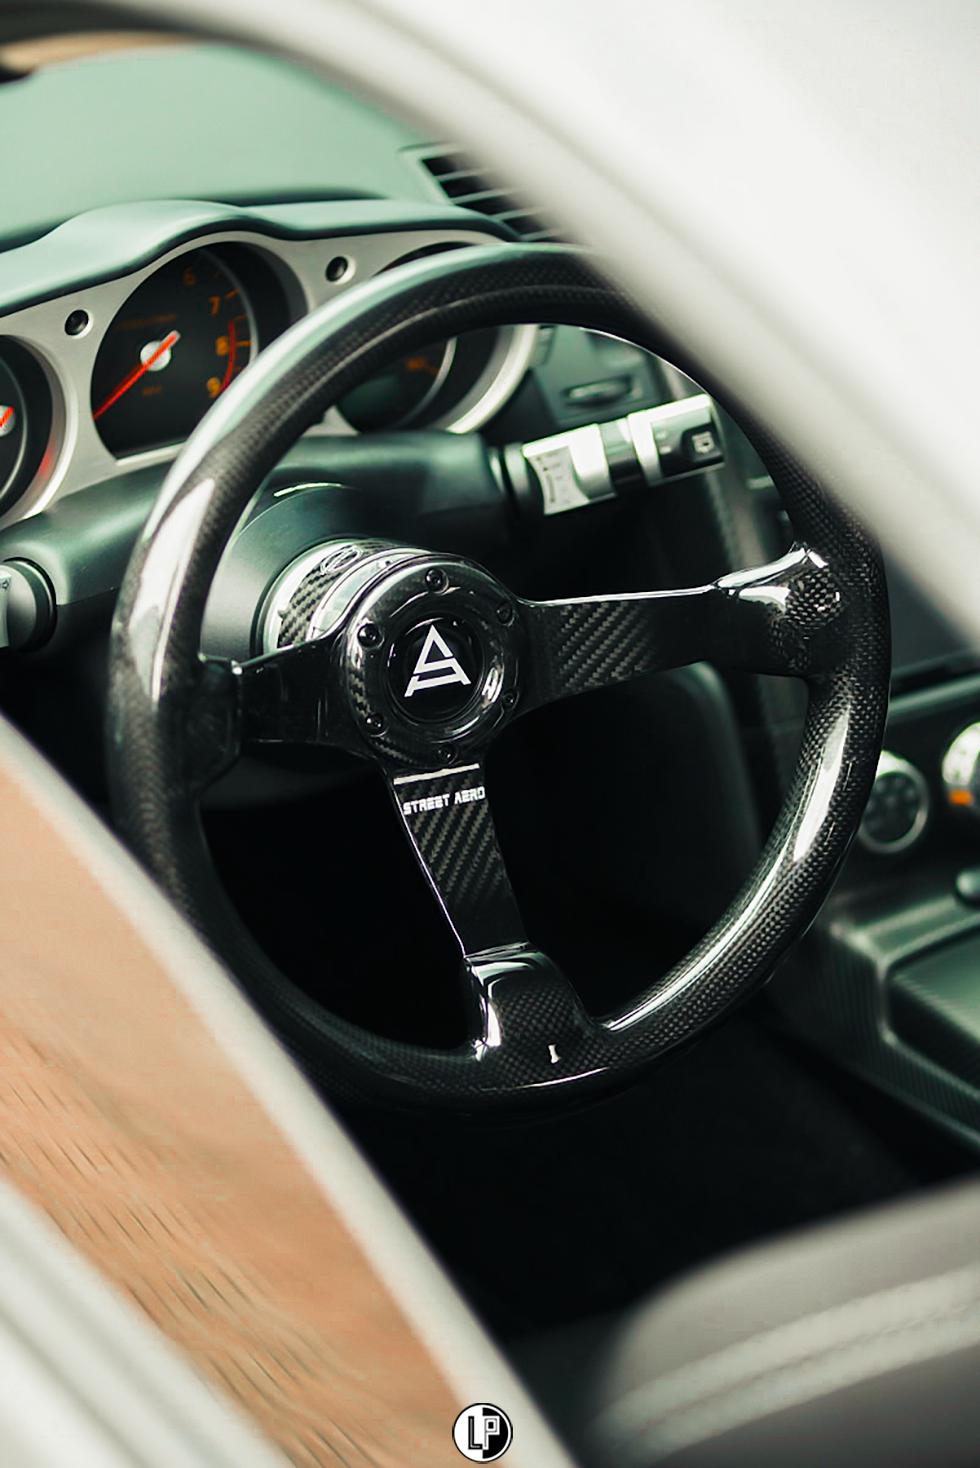 Carbon Fiber Steering Wheel by Street Aero